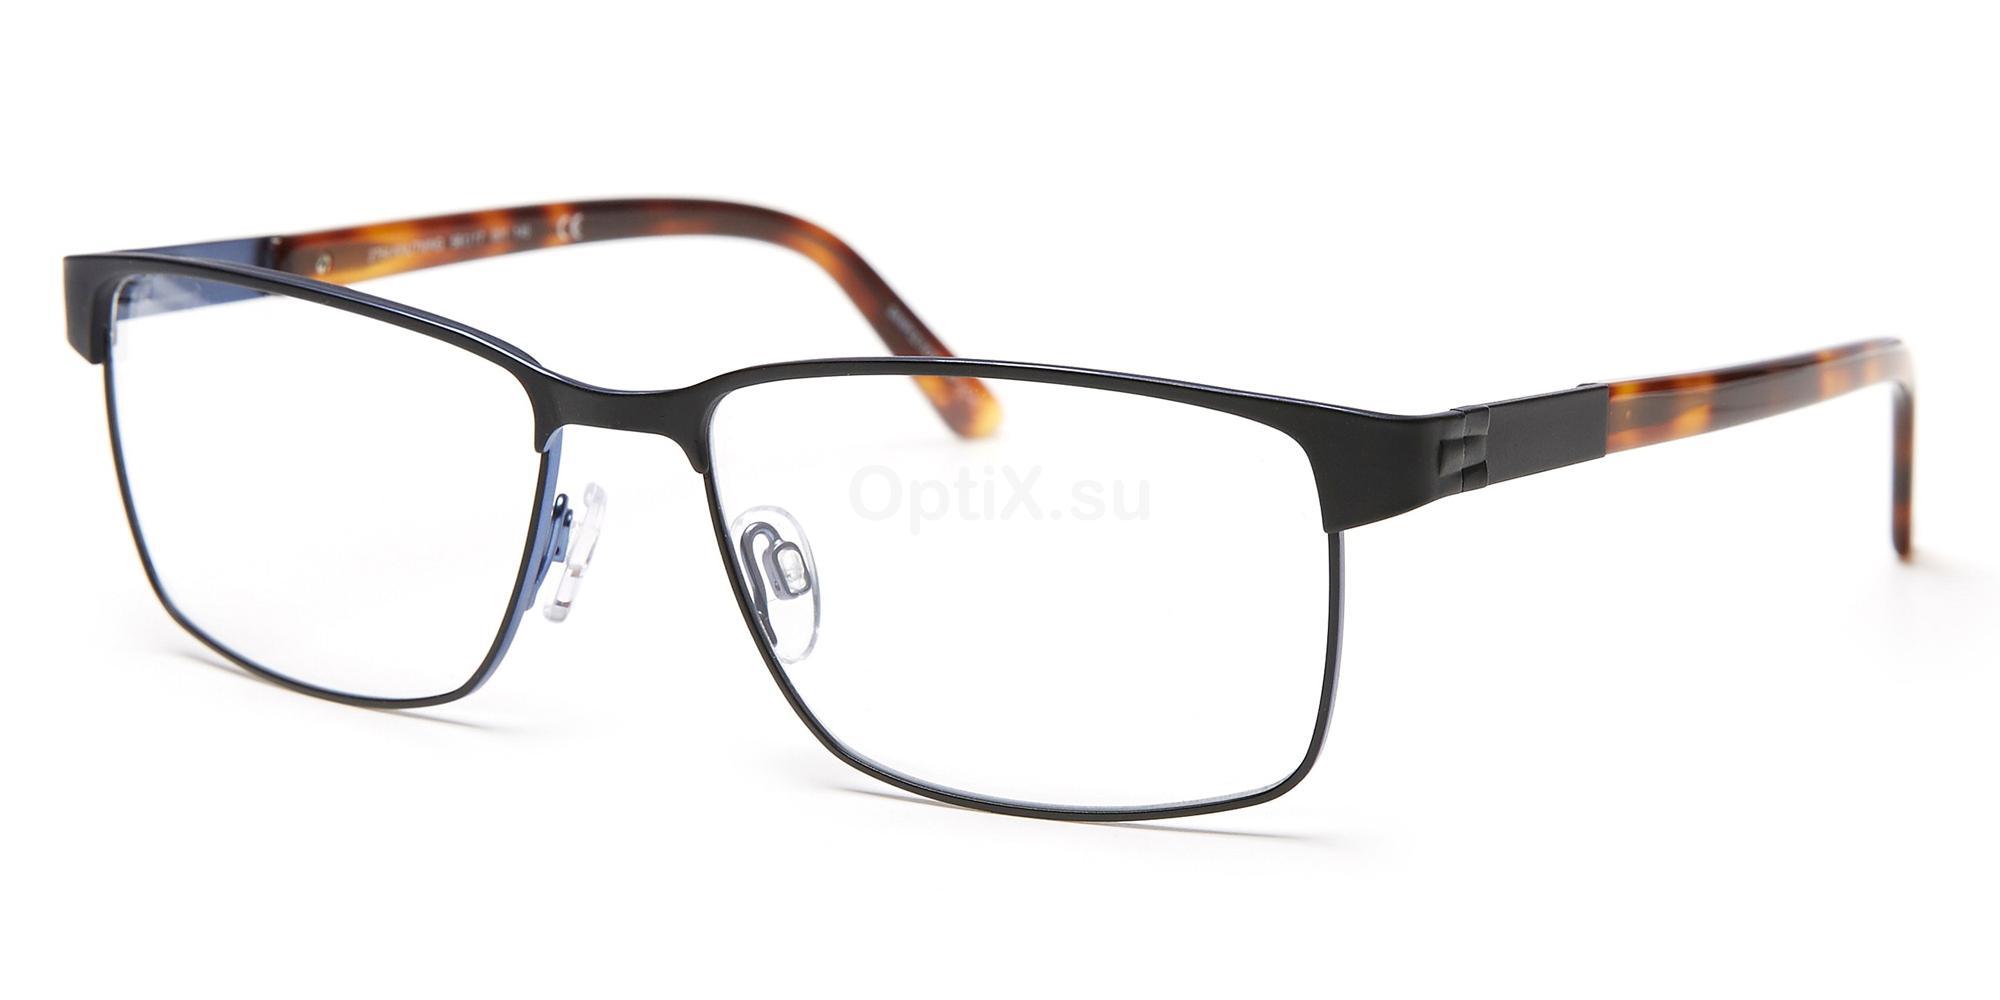 001 SK2754 KNUTING Glasses, Skaga